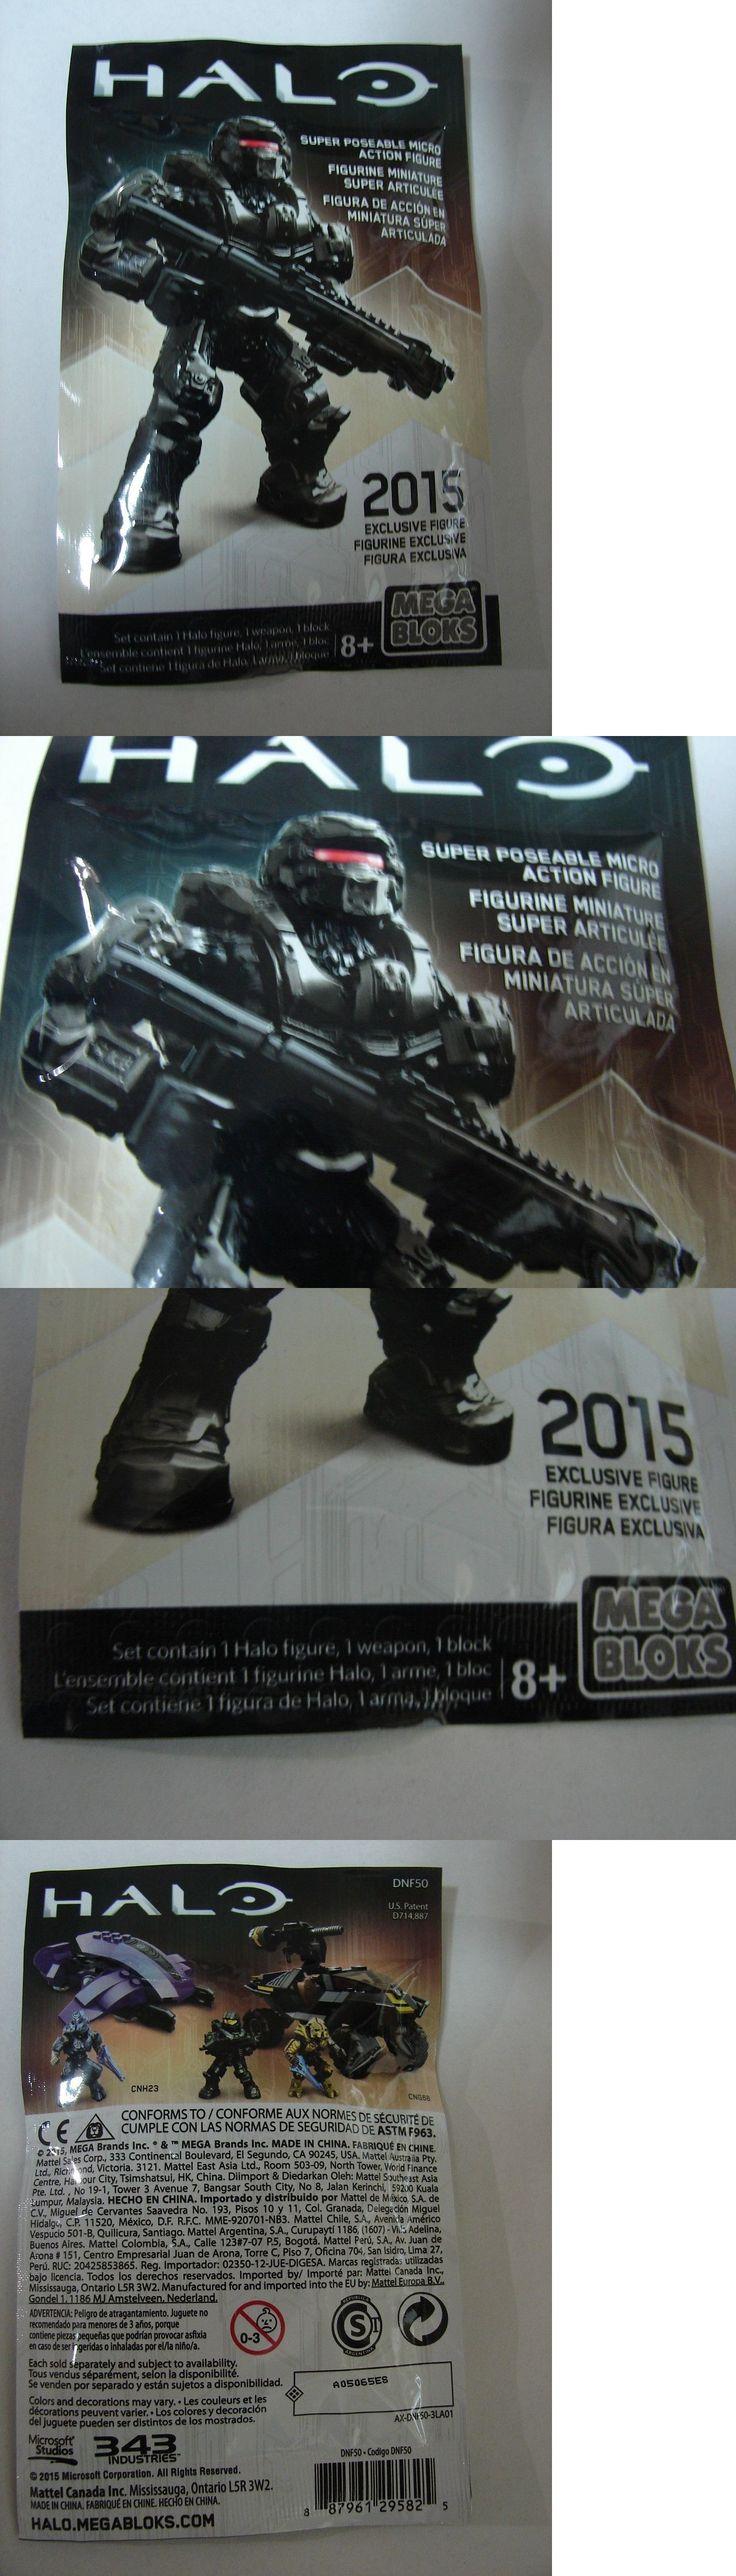 Mega Bloks 52338: Sdcc ? 2015 Mega Bloks Halo Exclusive Rare Figure Spartan Warrior Red Visor -> BUY IT NOW ONLY: $34.95 on eBay!